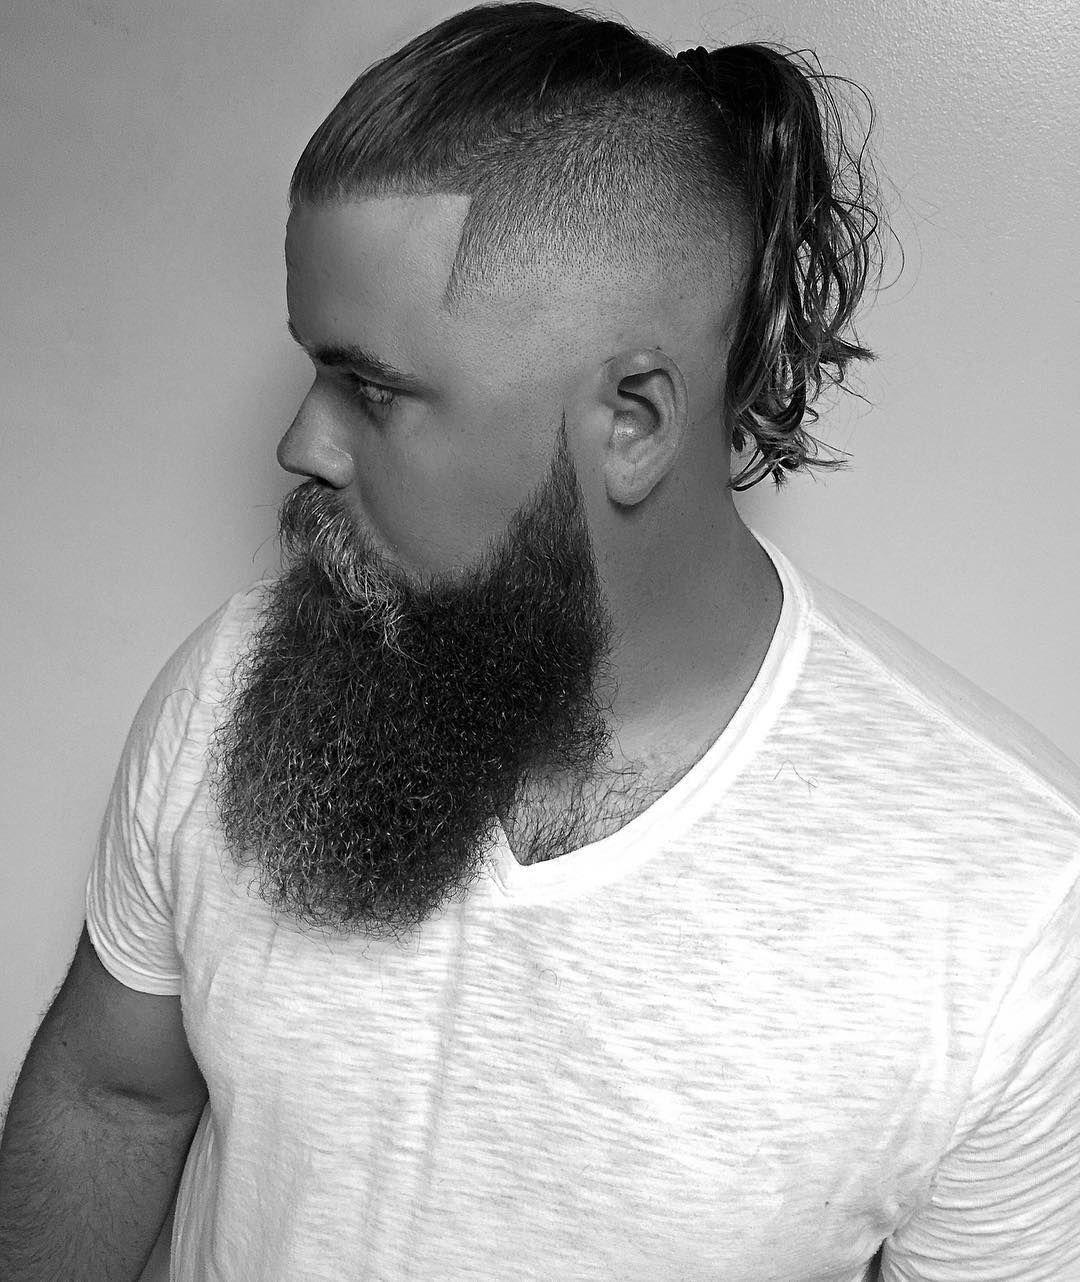 25 popular haircuts for men 2017 frisur mann vikings und trends